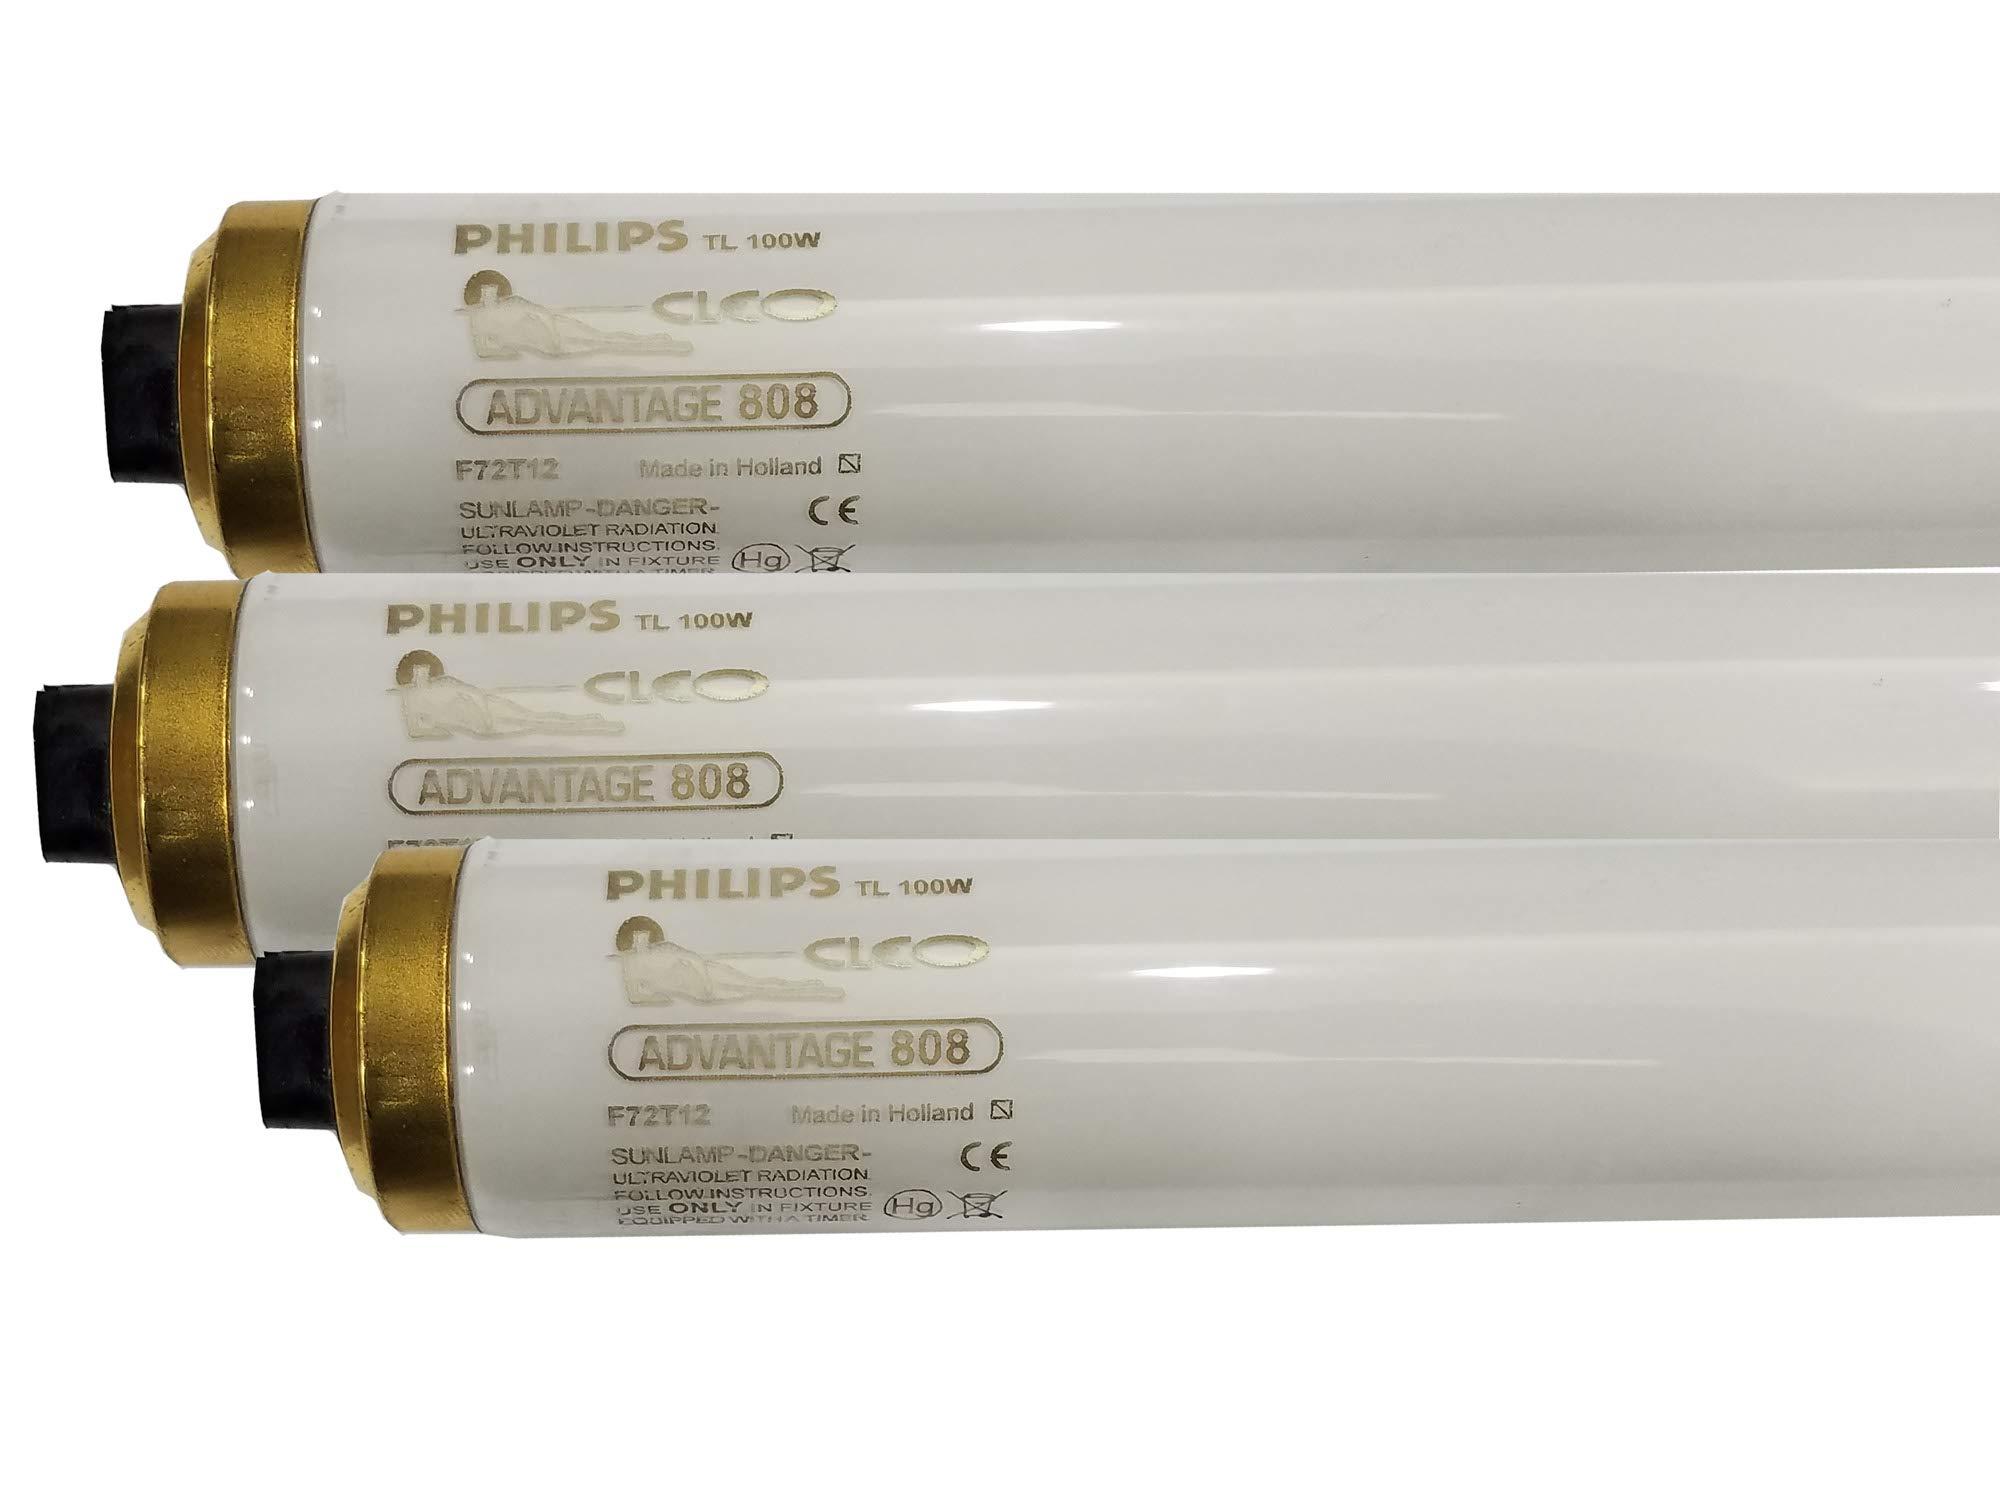 Philips Cleo Advantage 808 Tanning Bulbs F72T12 HO RDC 100W - Intense Bronze! (16)